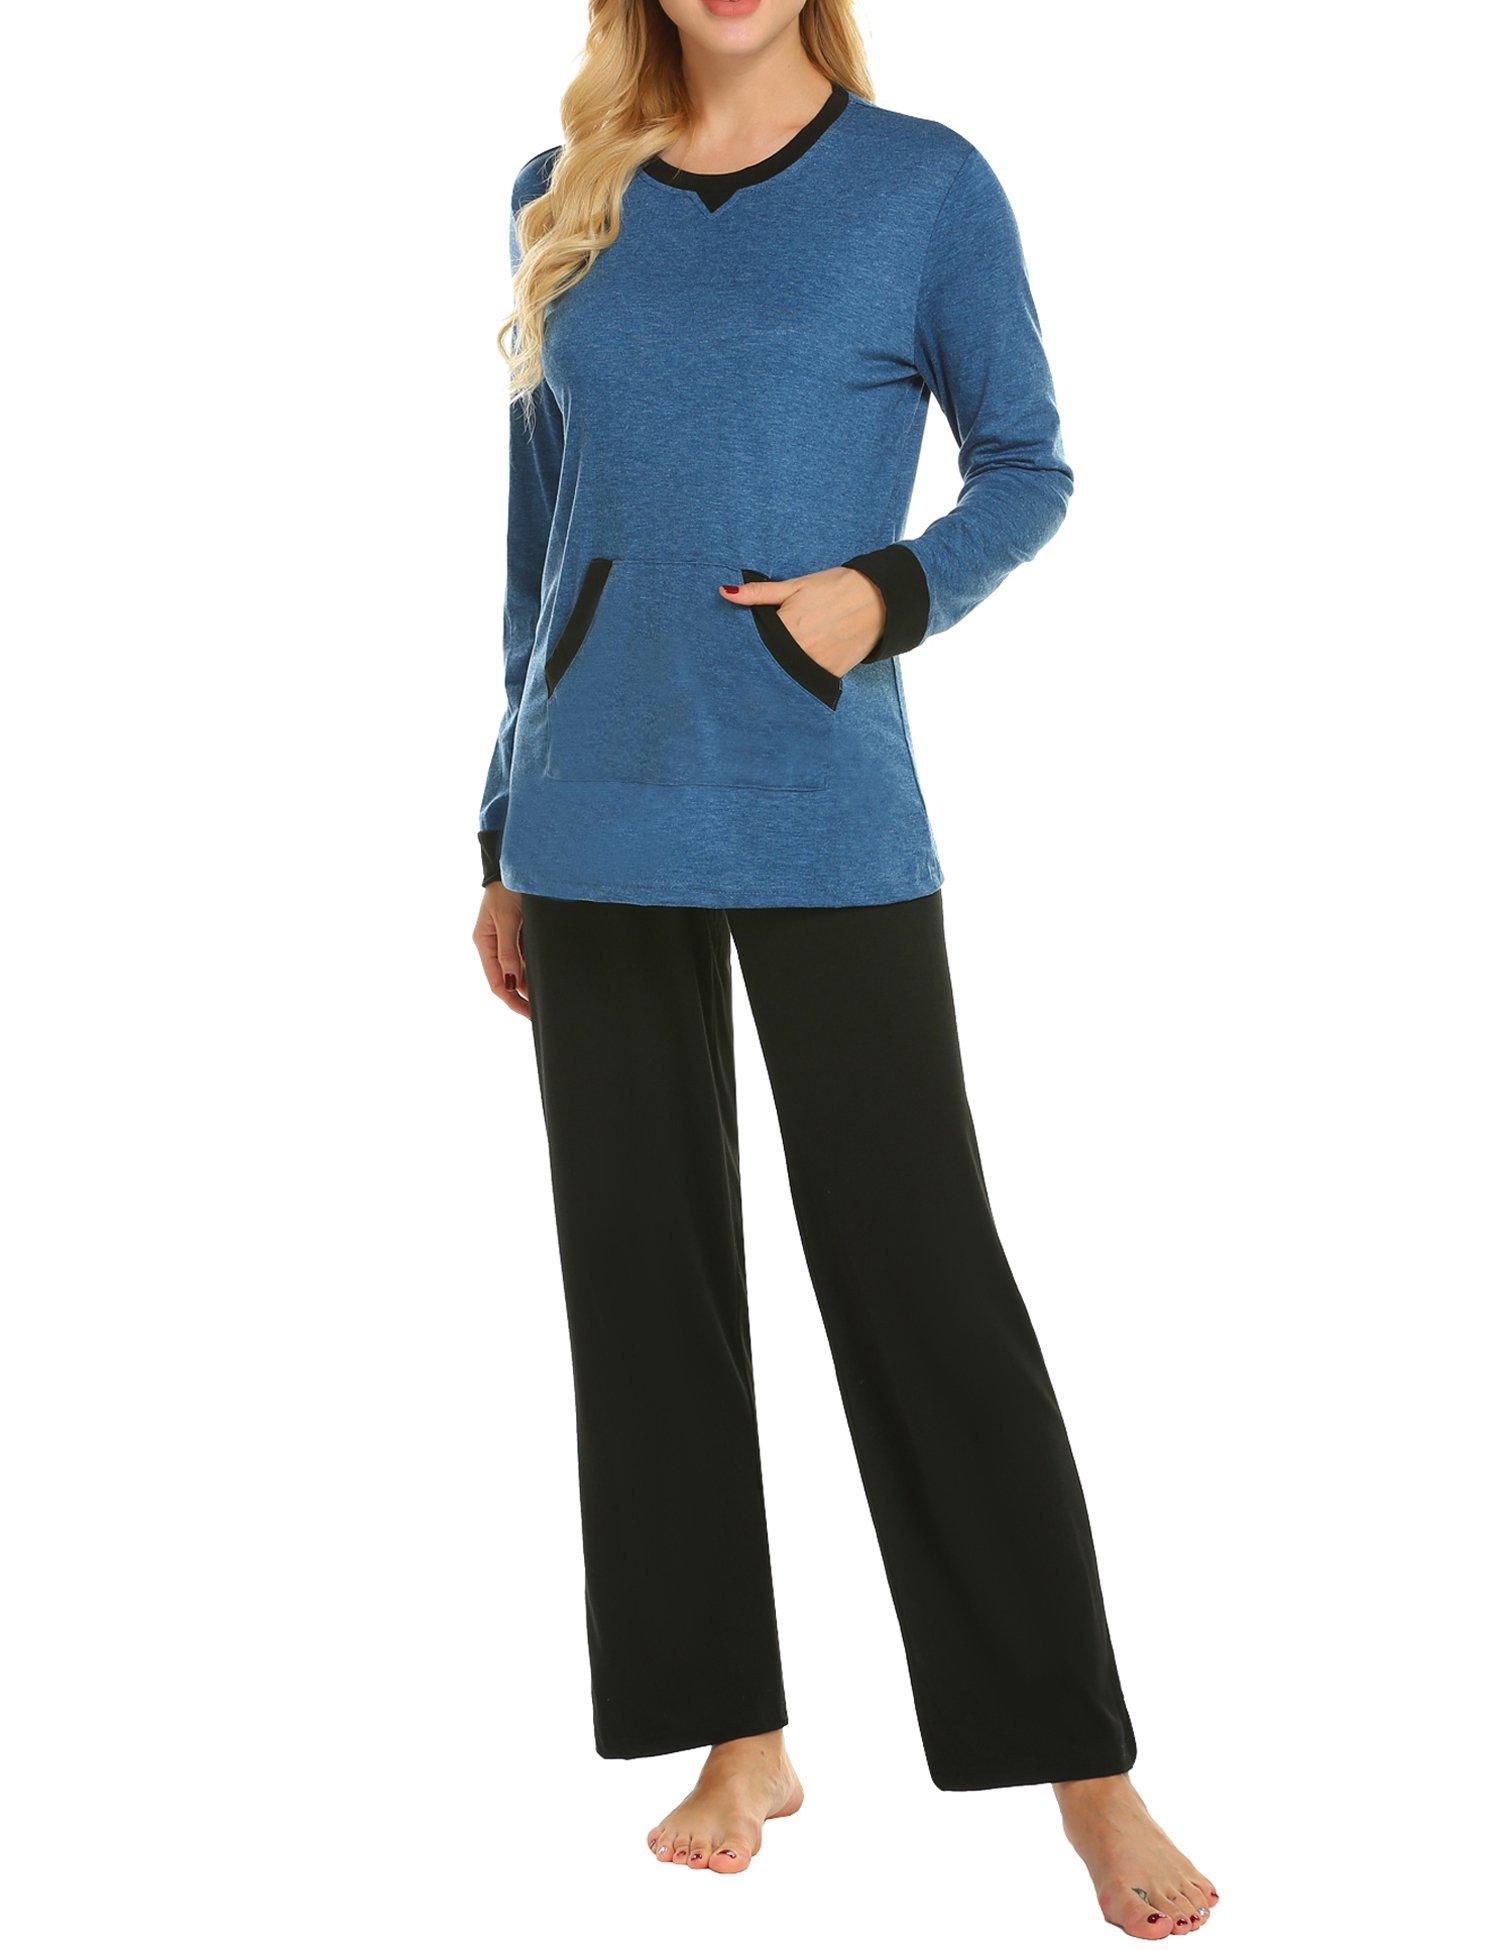 MAXMODA Pajama Set Women's Long Sleeve Pocket Sleepwear Soft Pj Set Loungewear S-XXL